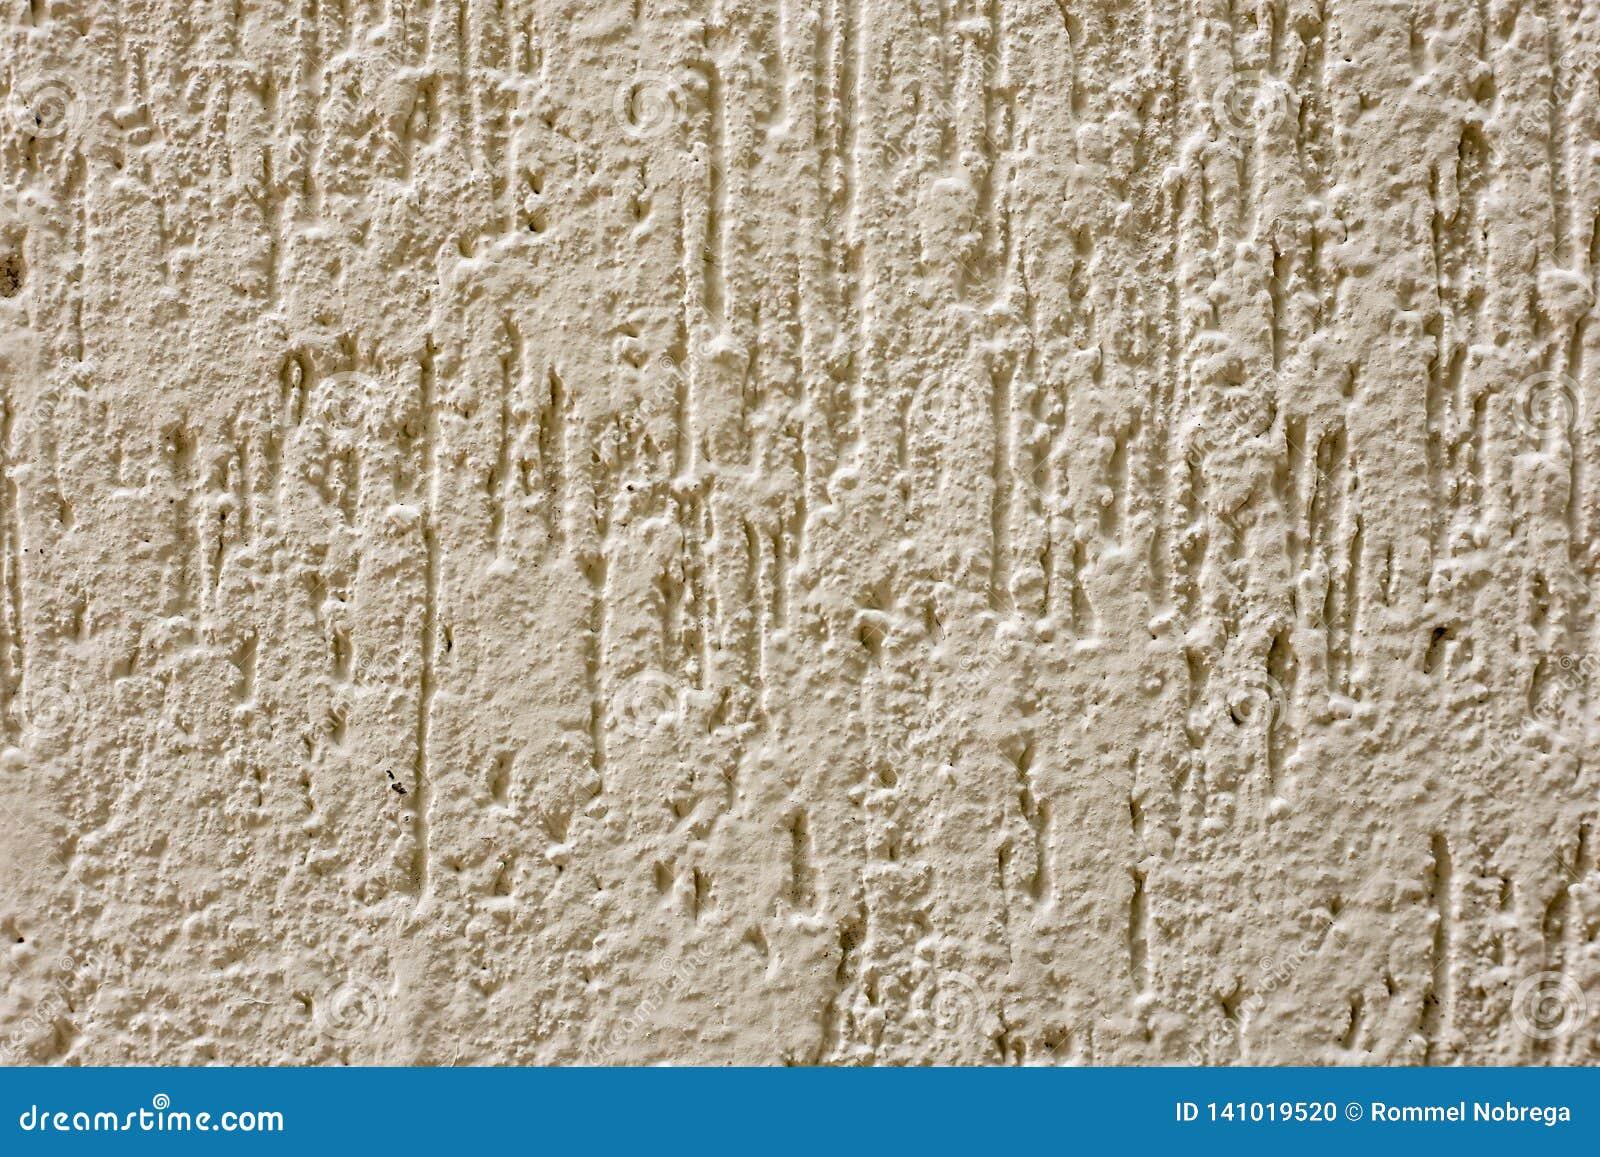 Muur met witte textuur